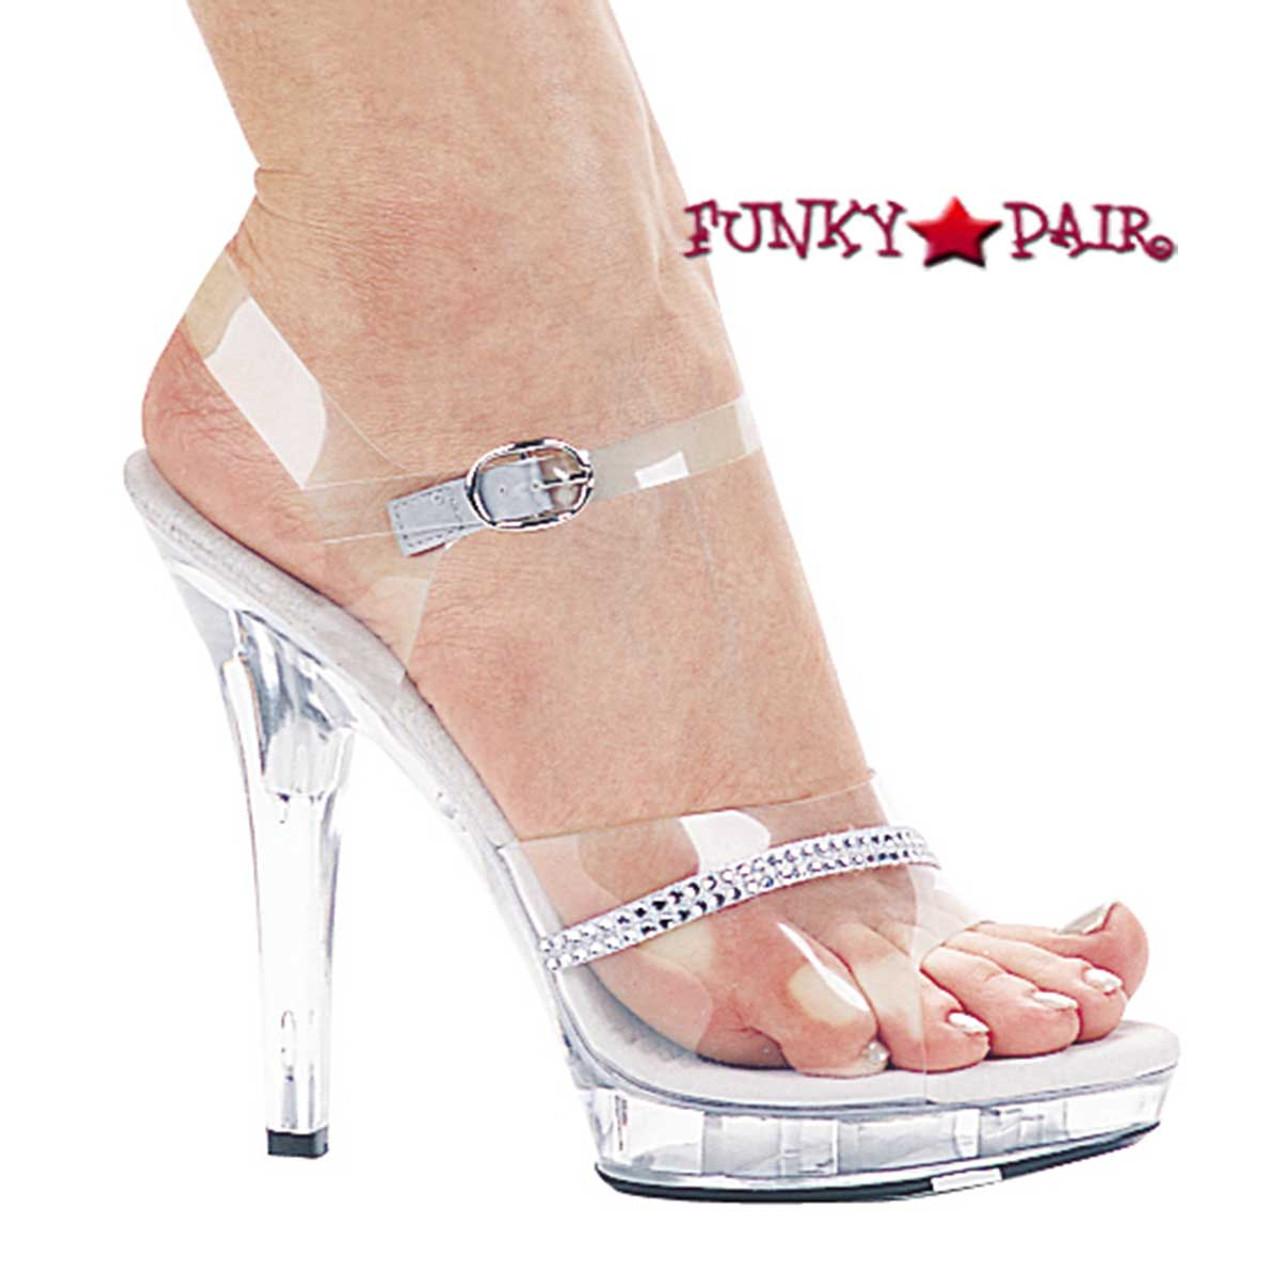 M-Jewel, 5 Inch High Heel With 3/4 Inch Platform Clear